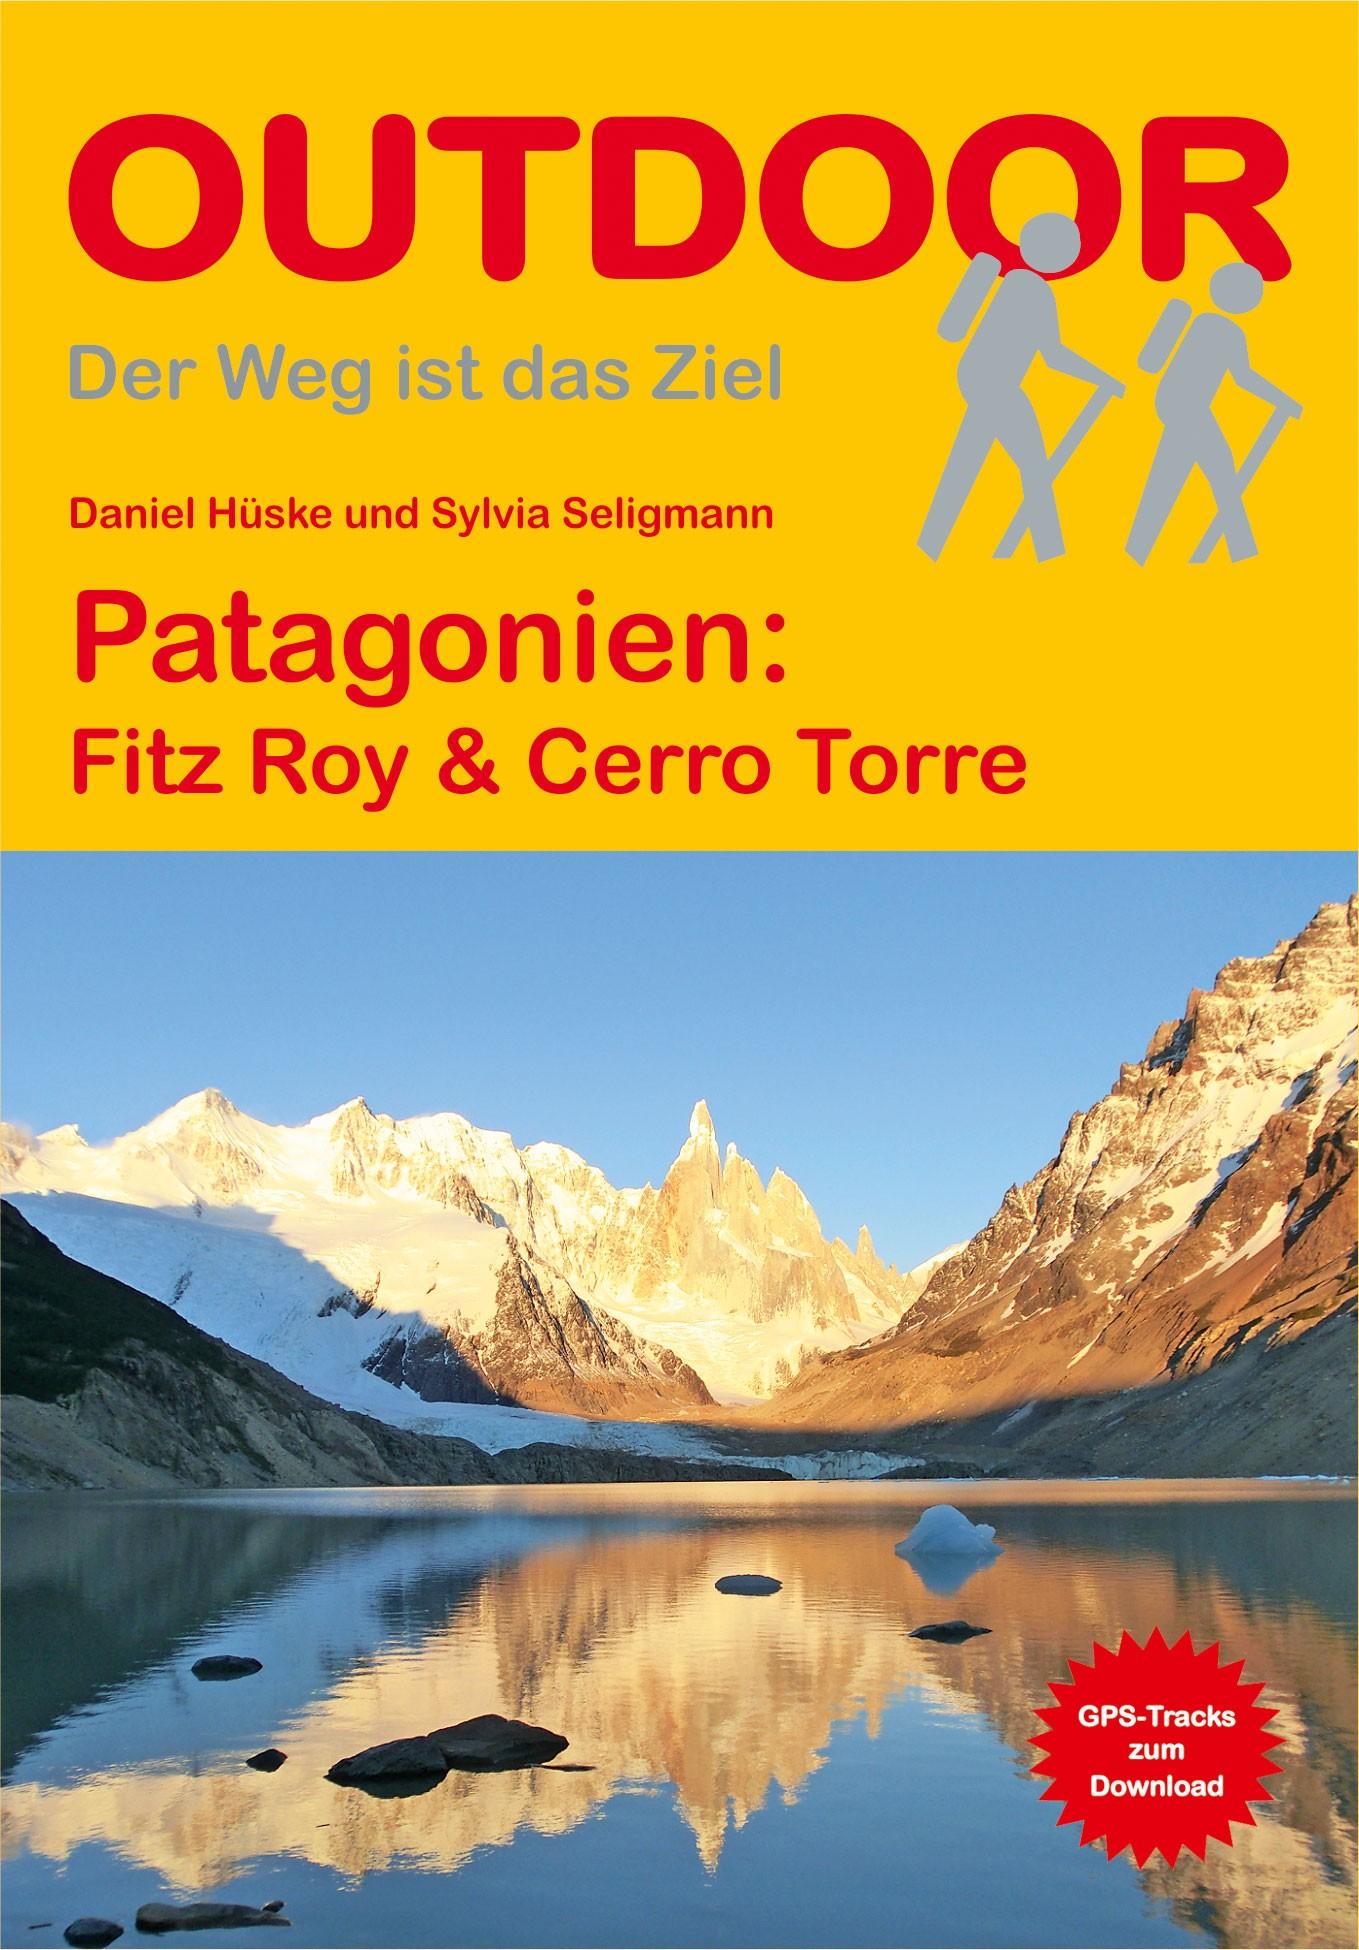 Patagonien: Fitz Roy & Cerro Torre